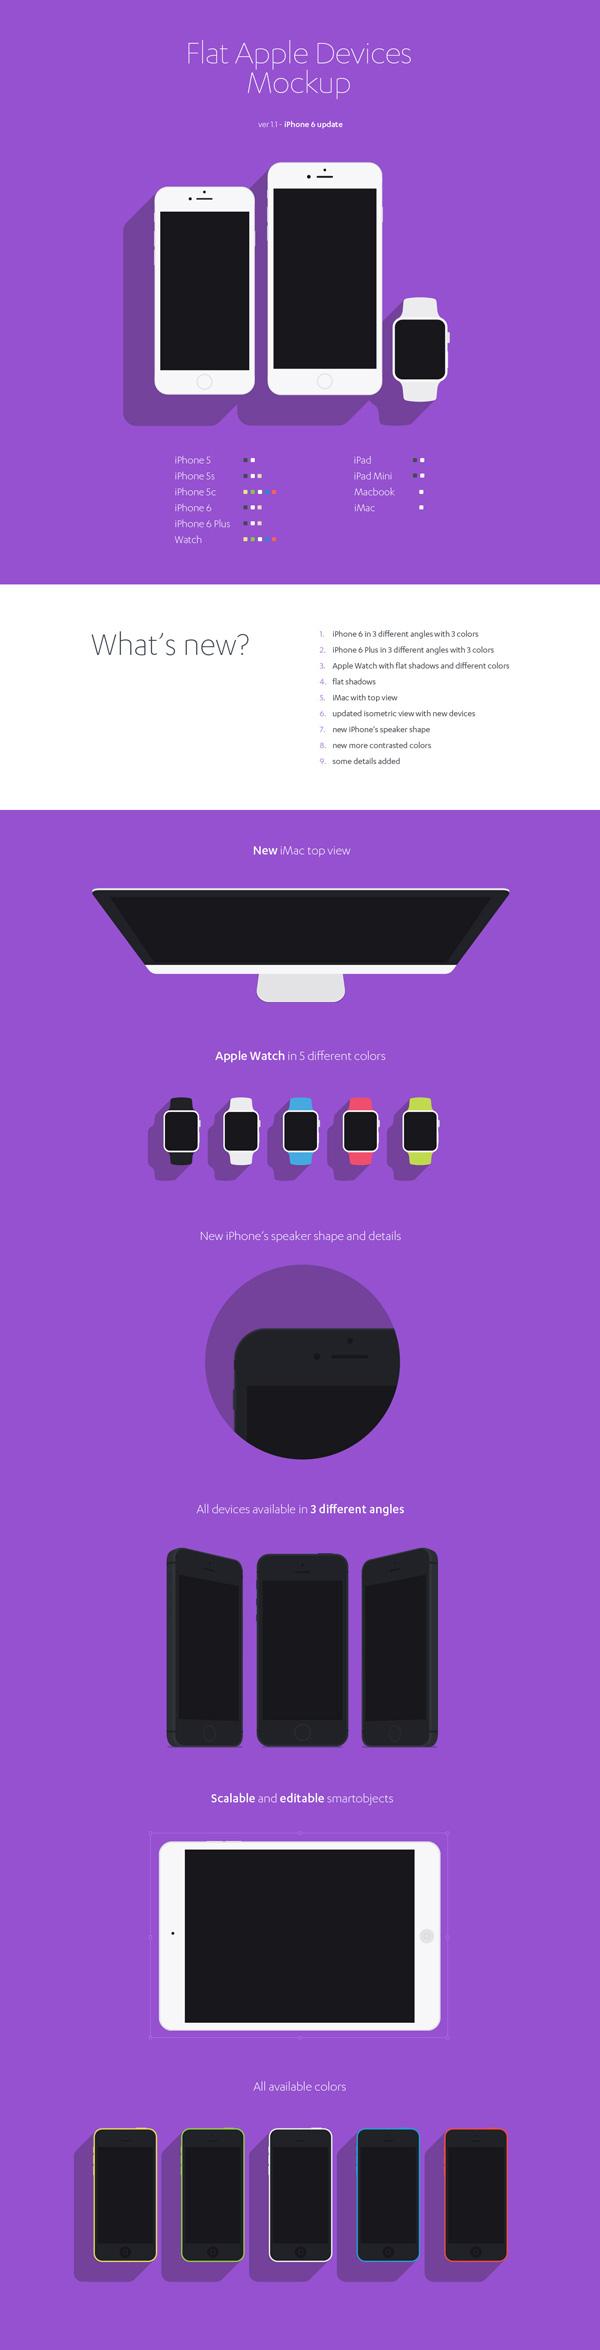 2.Flat-Apple-Devices-Mockup